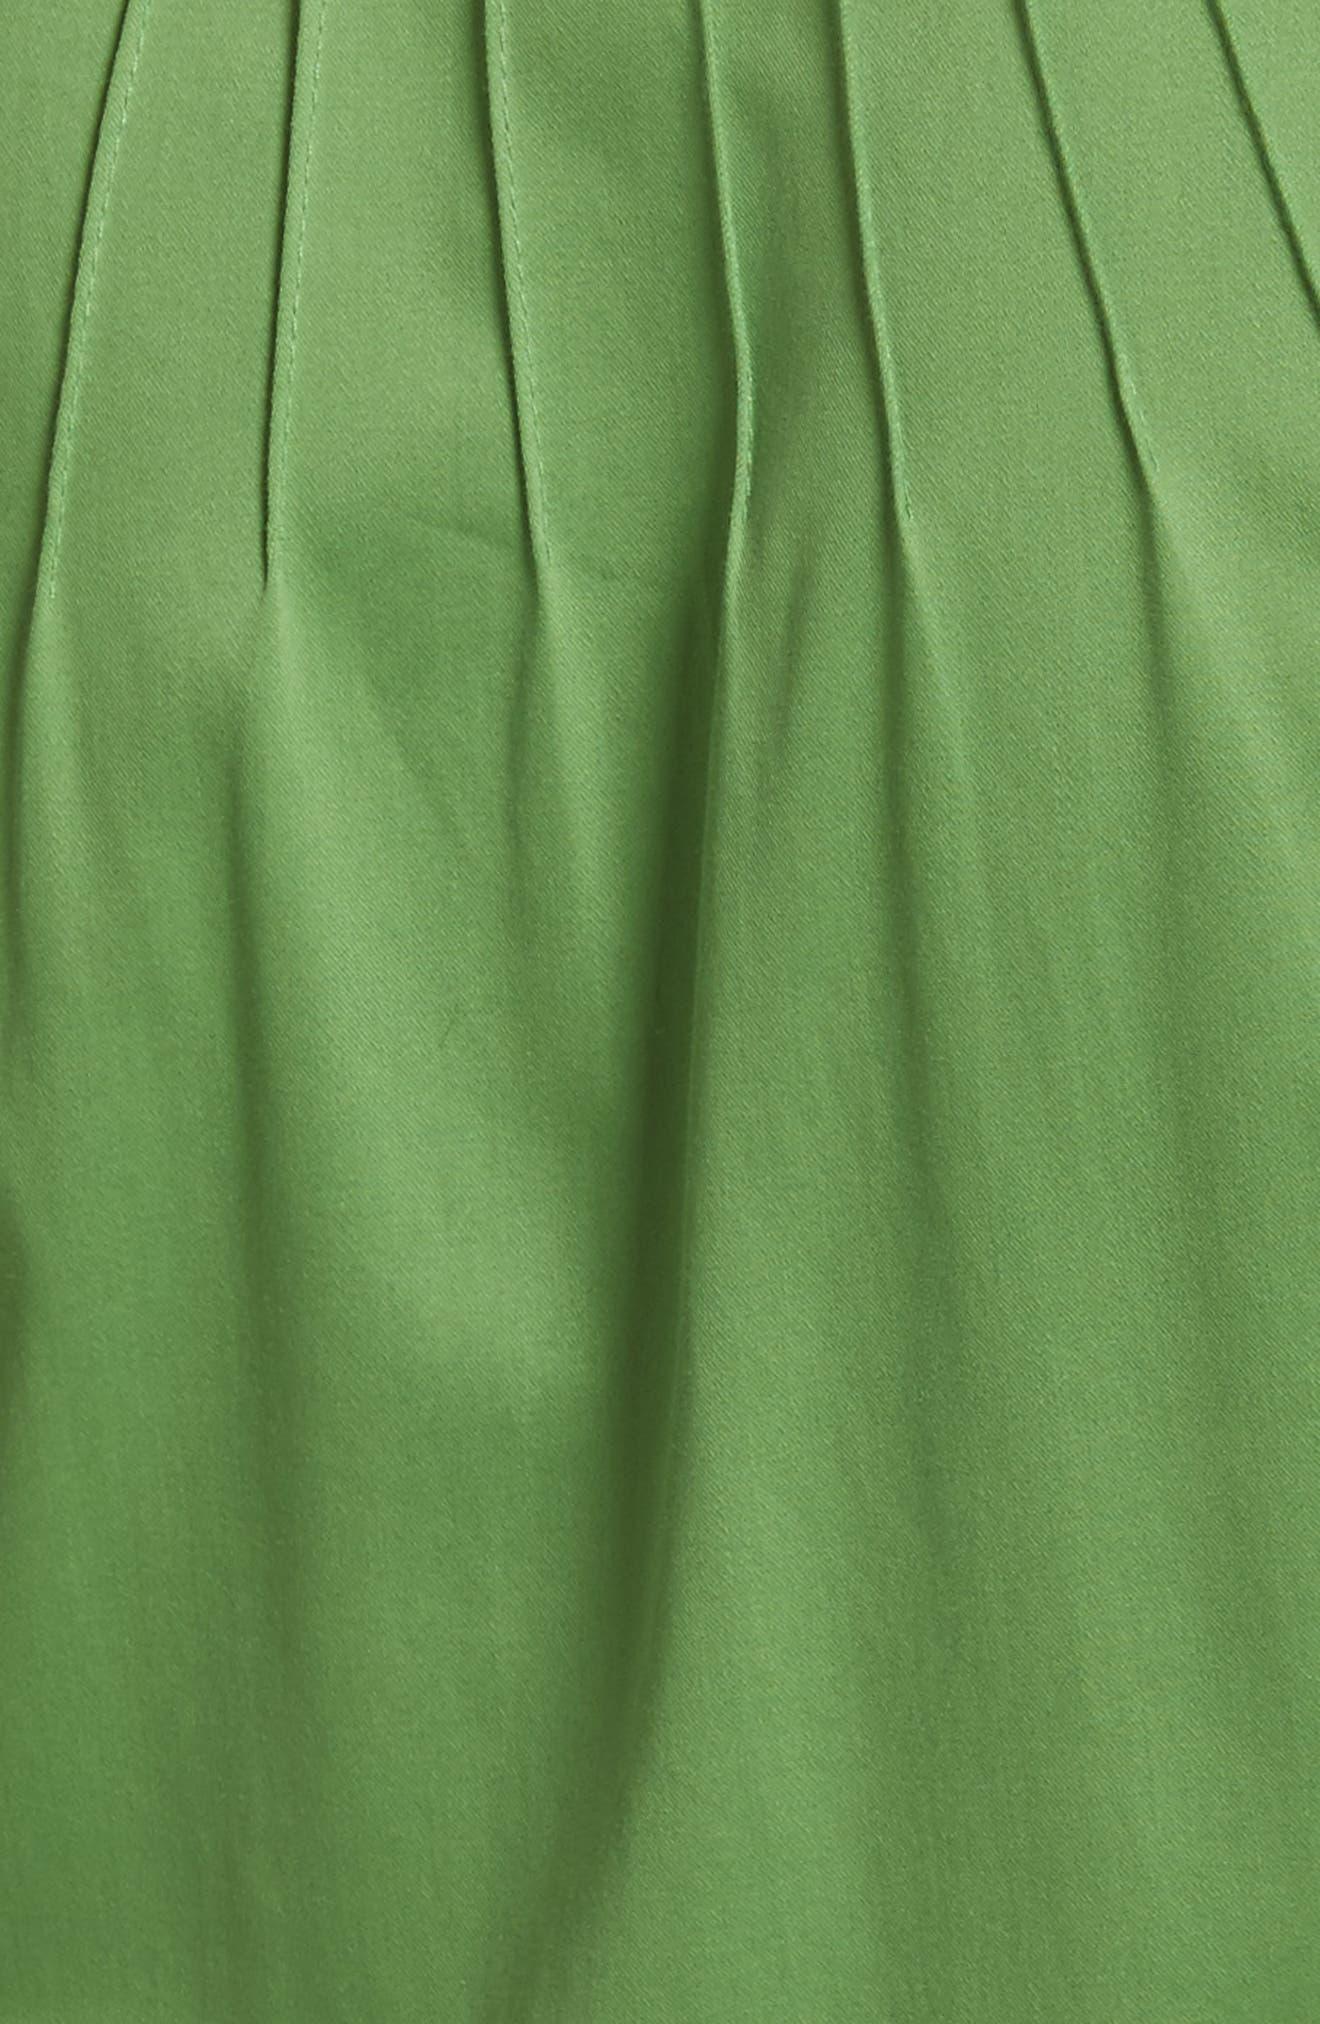 Diane von Furstenberg Pintuck Dress,                             Alternate thumbnail 5, color,                             Grass